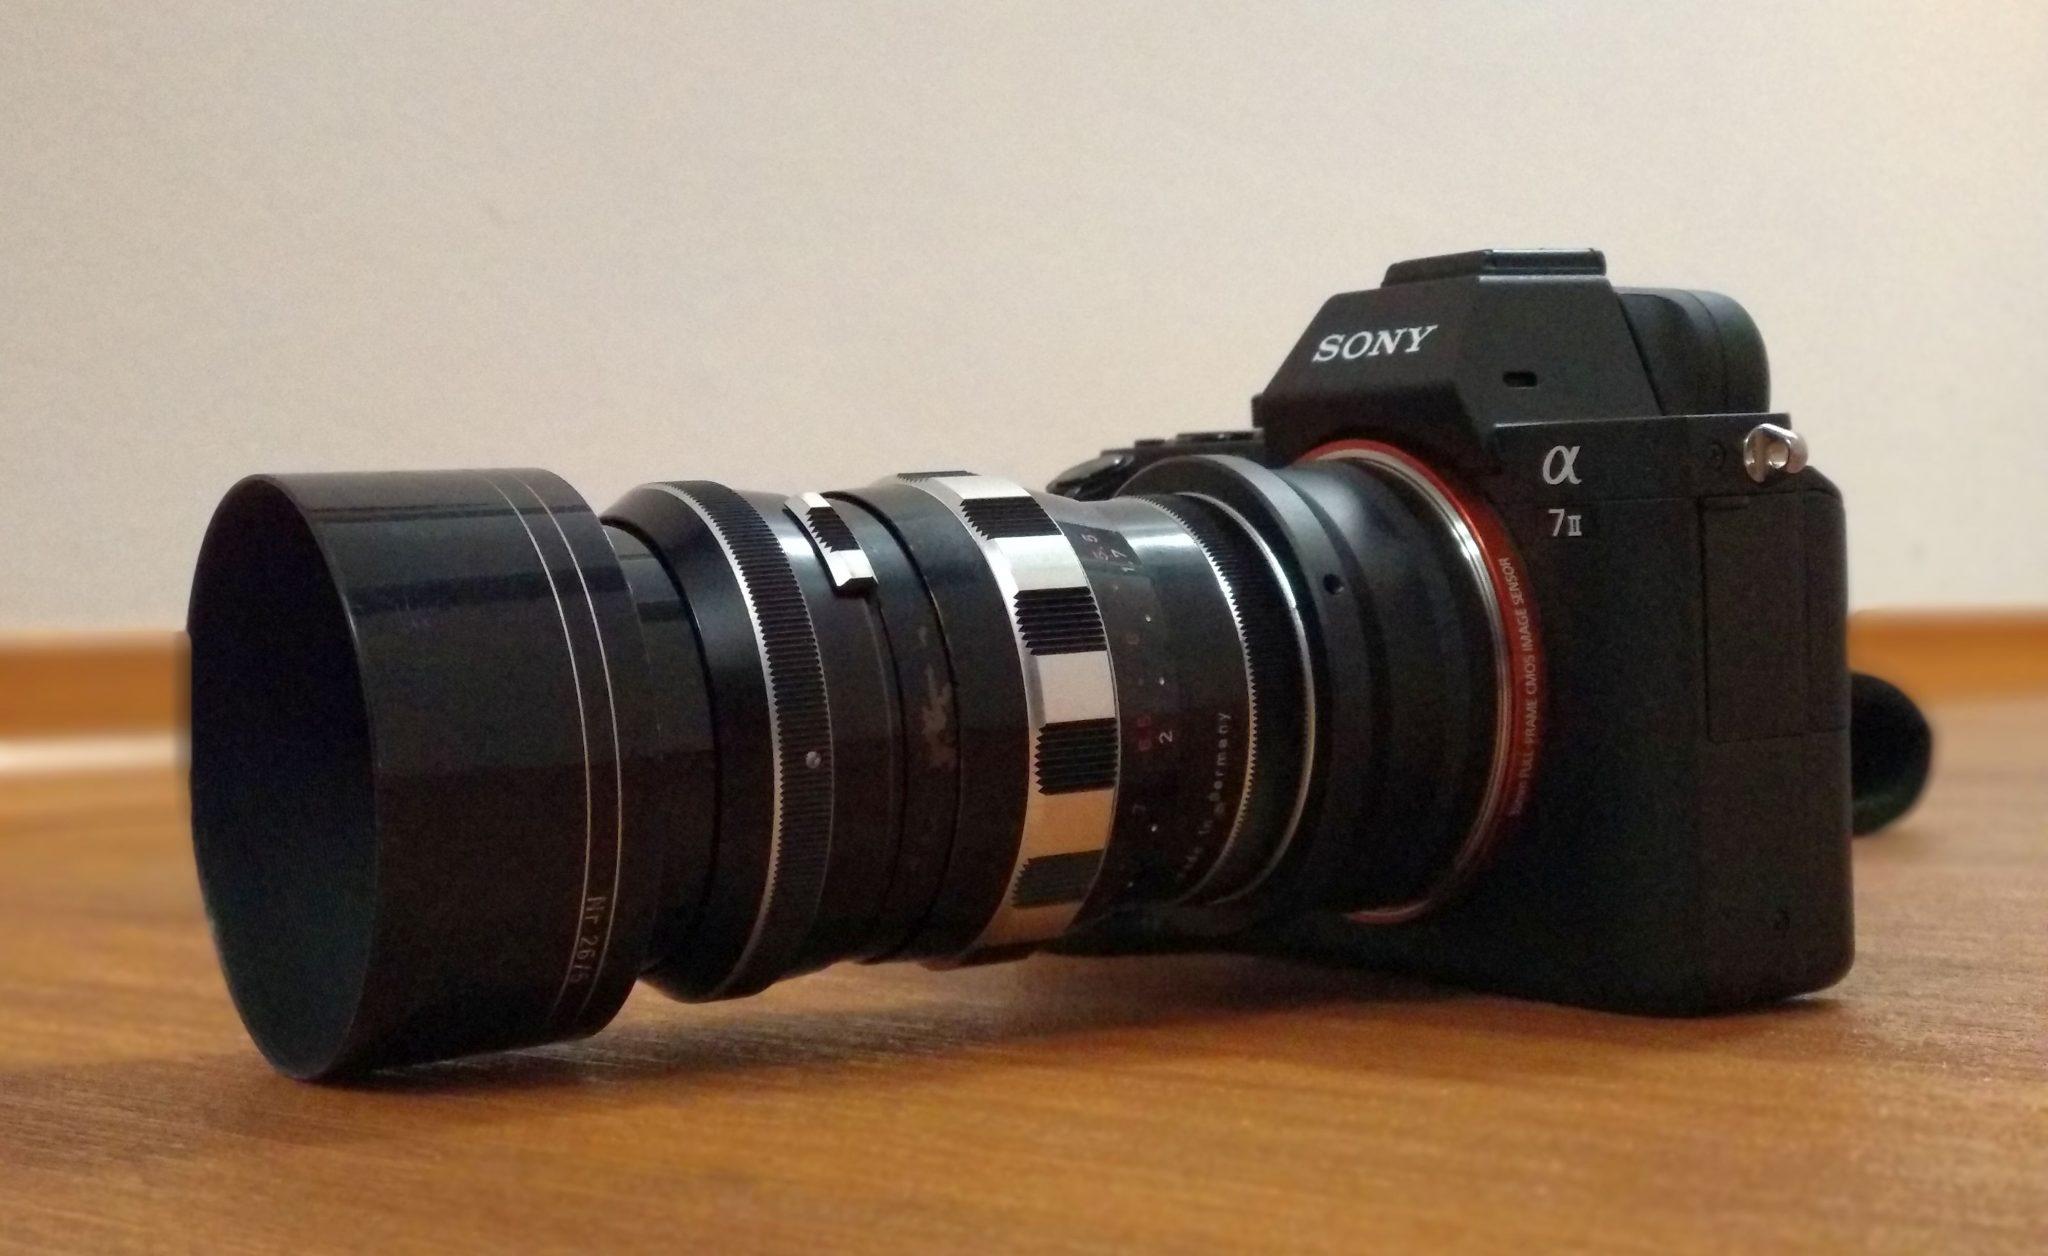 Objektivtest: Schneider-Kreuznach Tele-Xenar 135mm 3.5 (M42) an Sony A7II